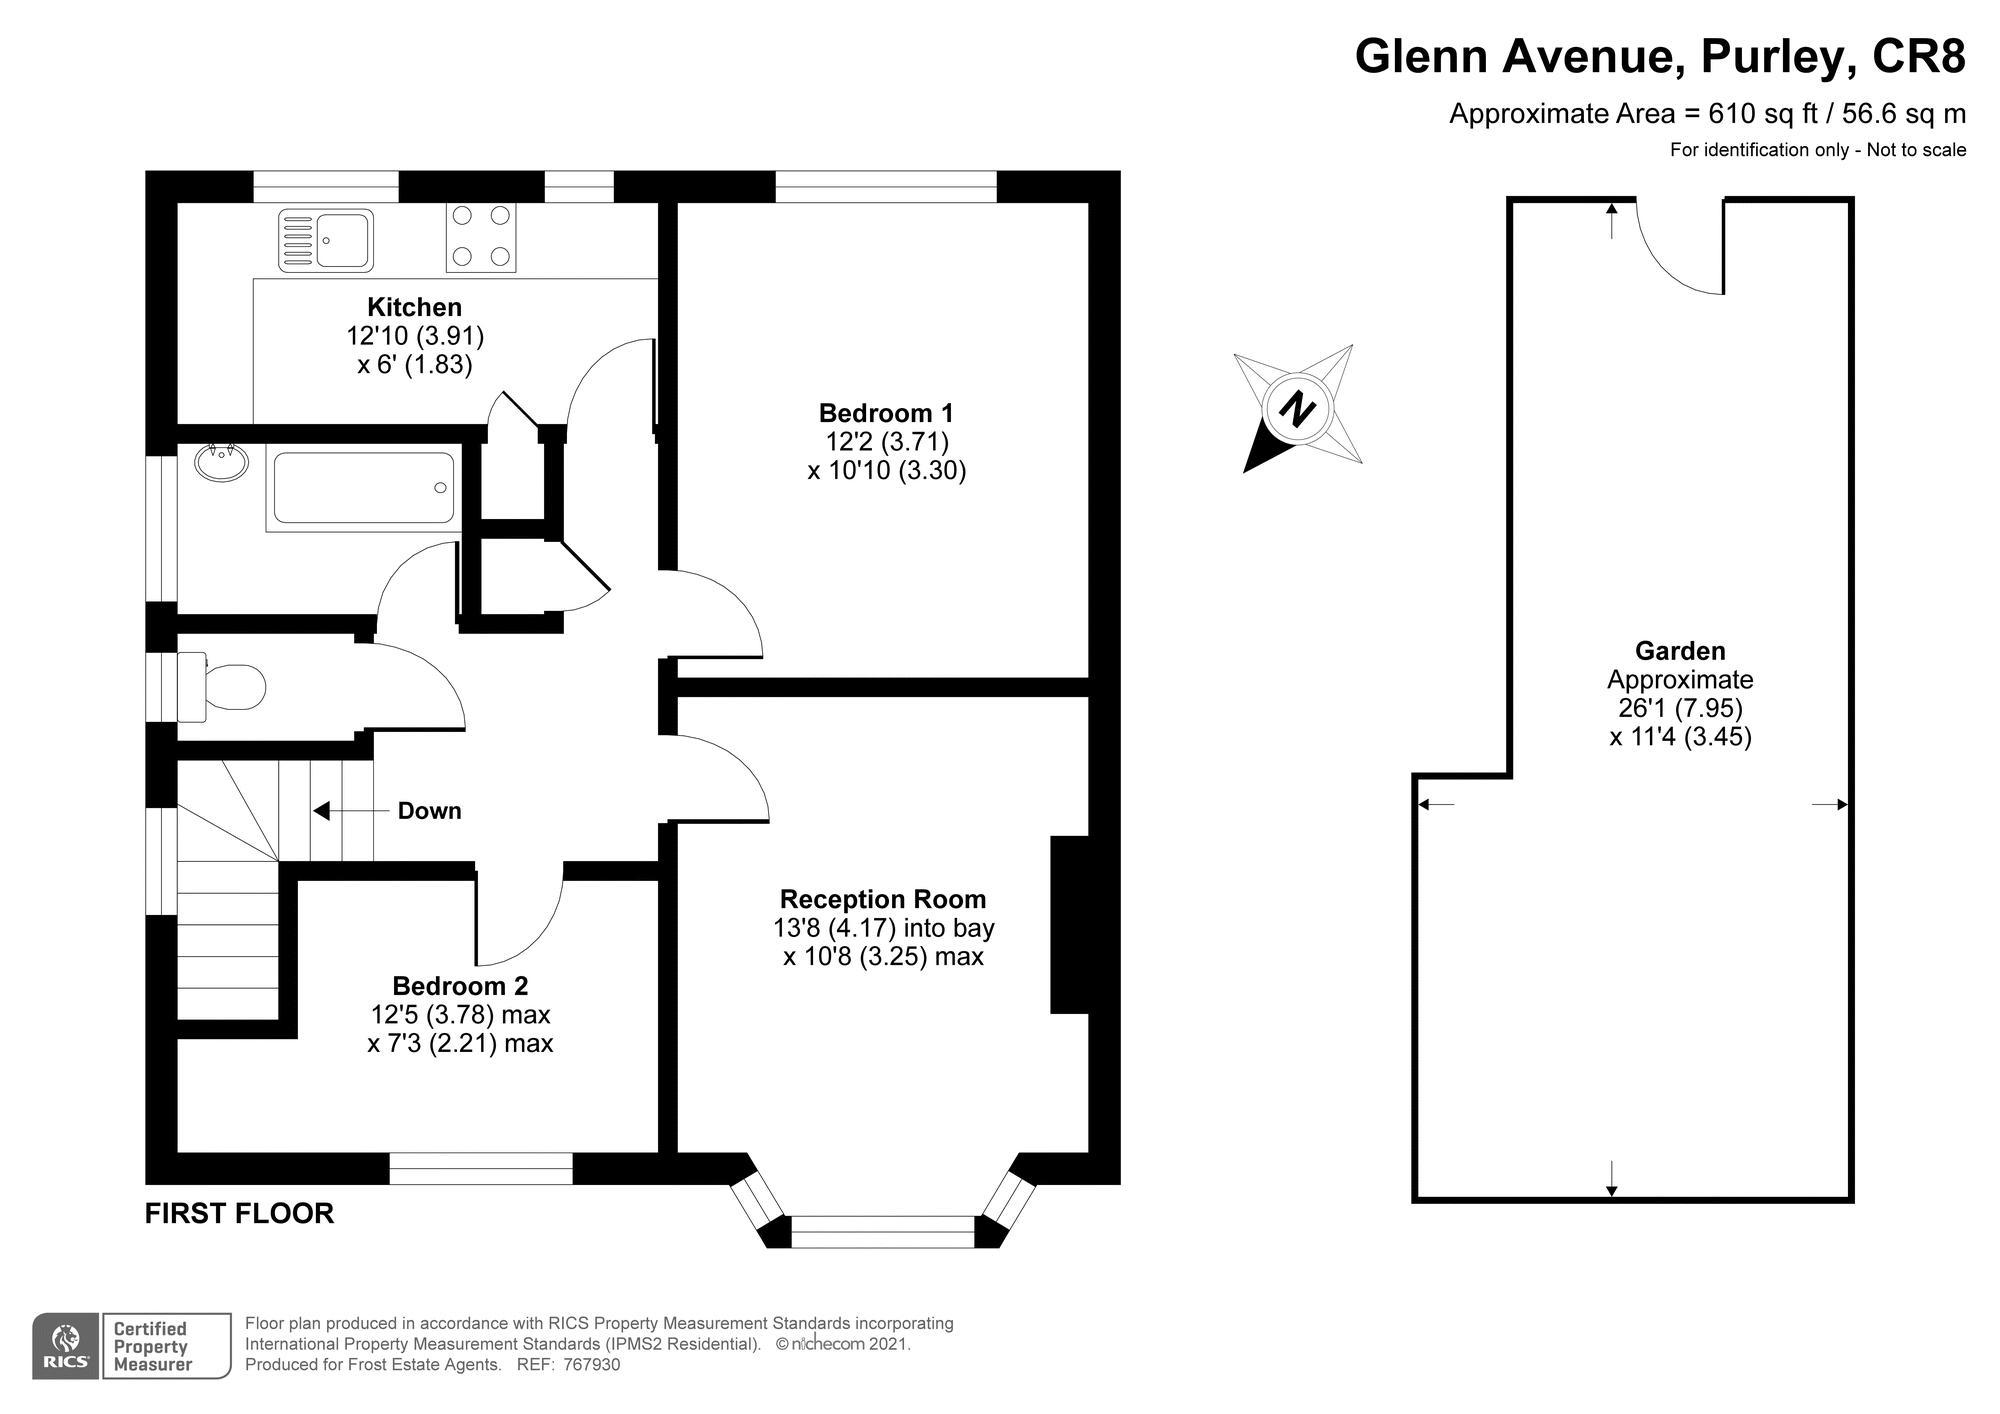 Glenn Avenue